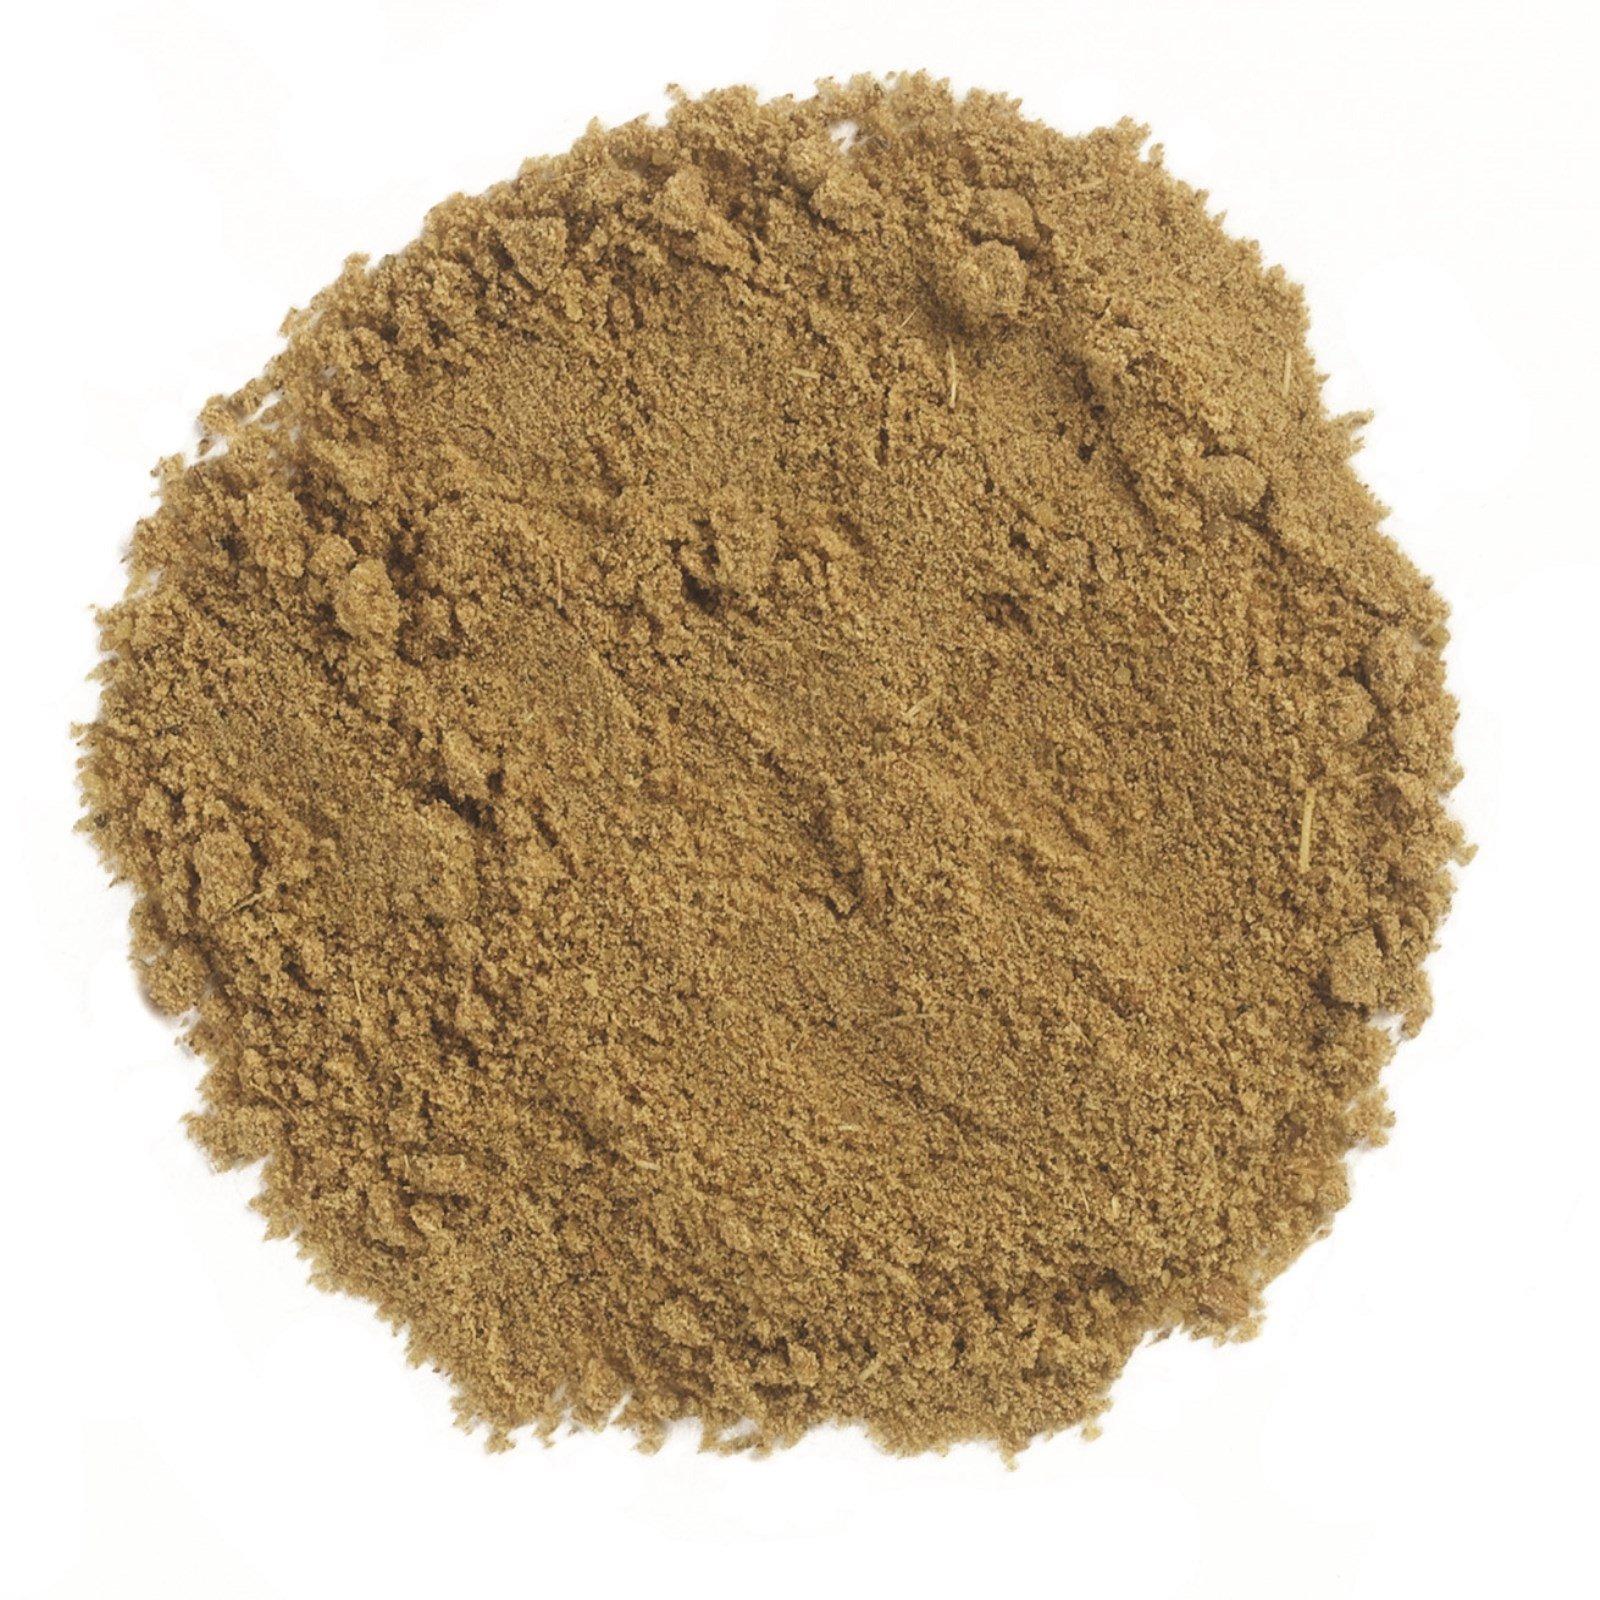 Frontier Natural Products, Органические молотые семена зиры, 16 унций (453 г)